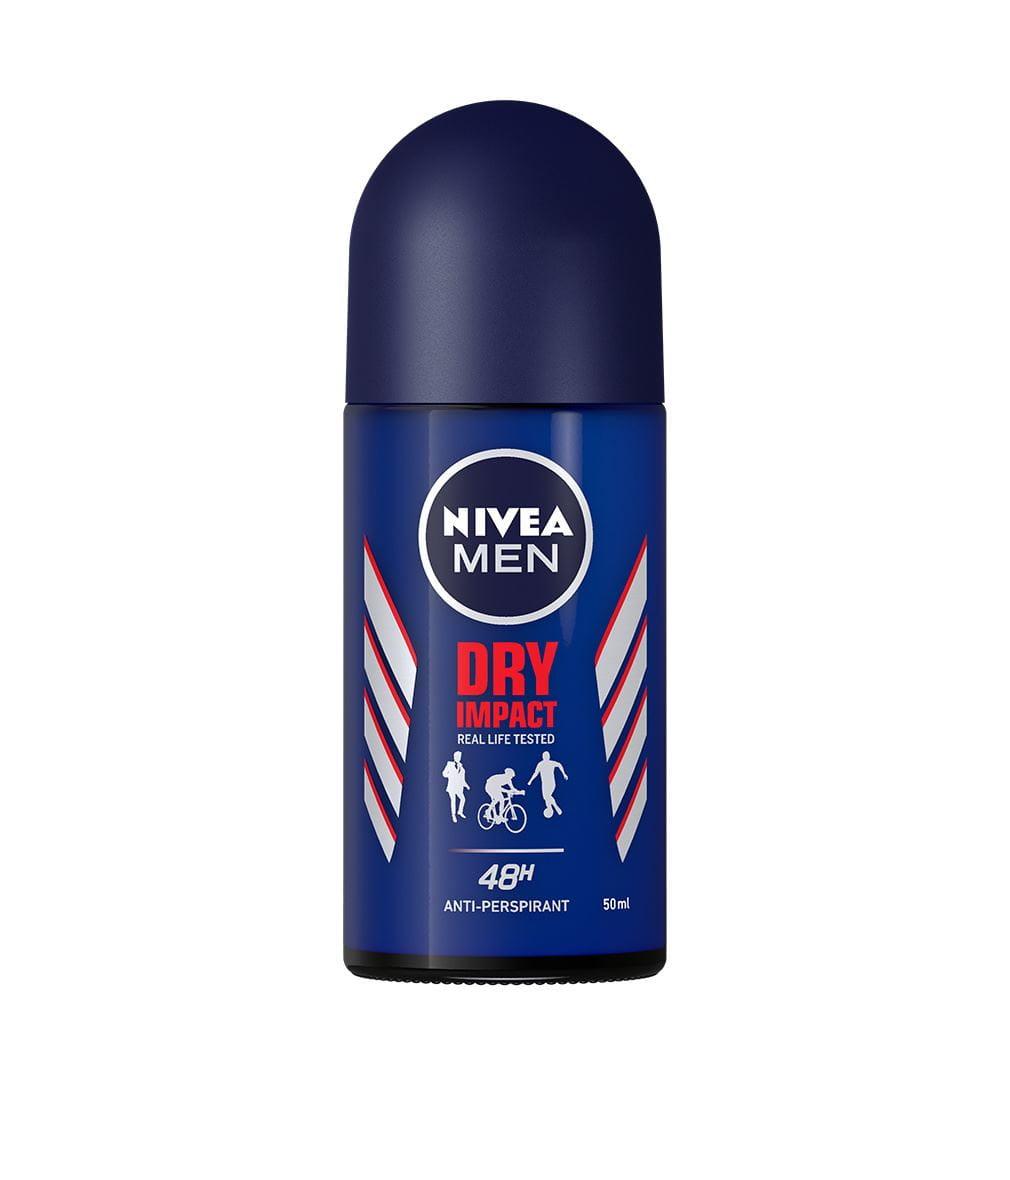 test karcsú spray)